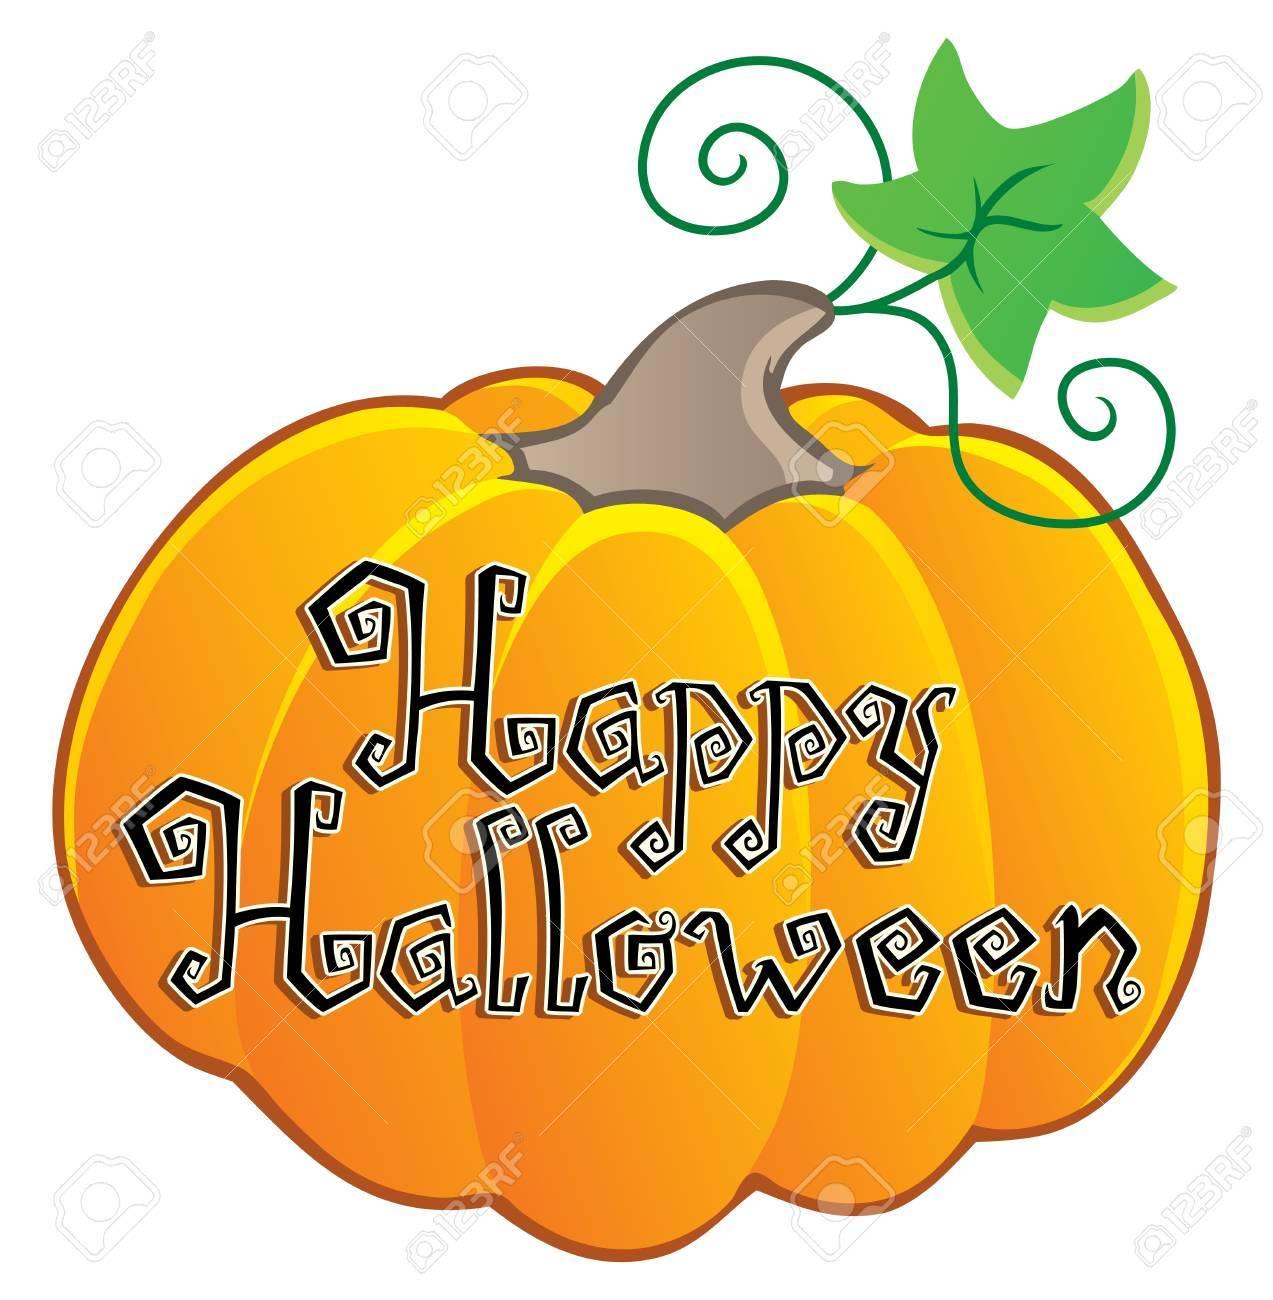 Happy Halloween topic image 2  illustration Stock Vector - 14603649